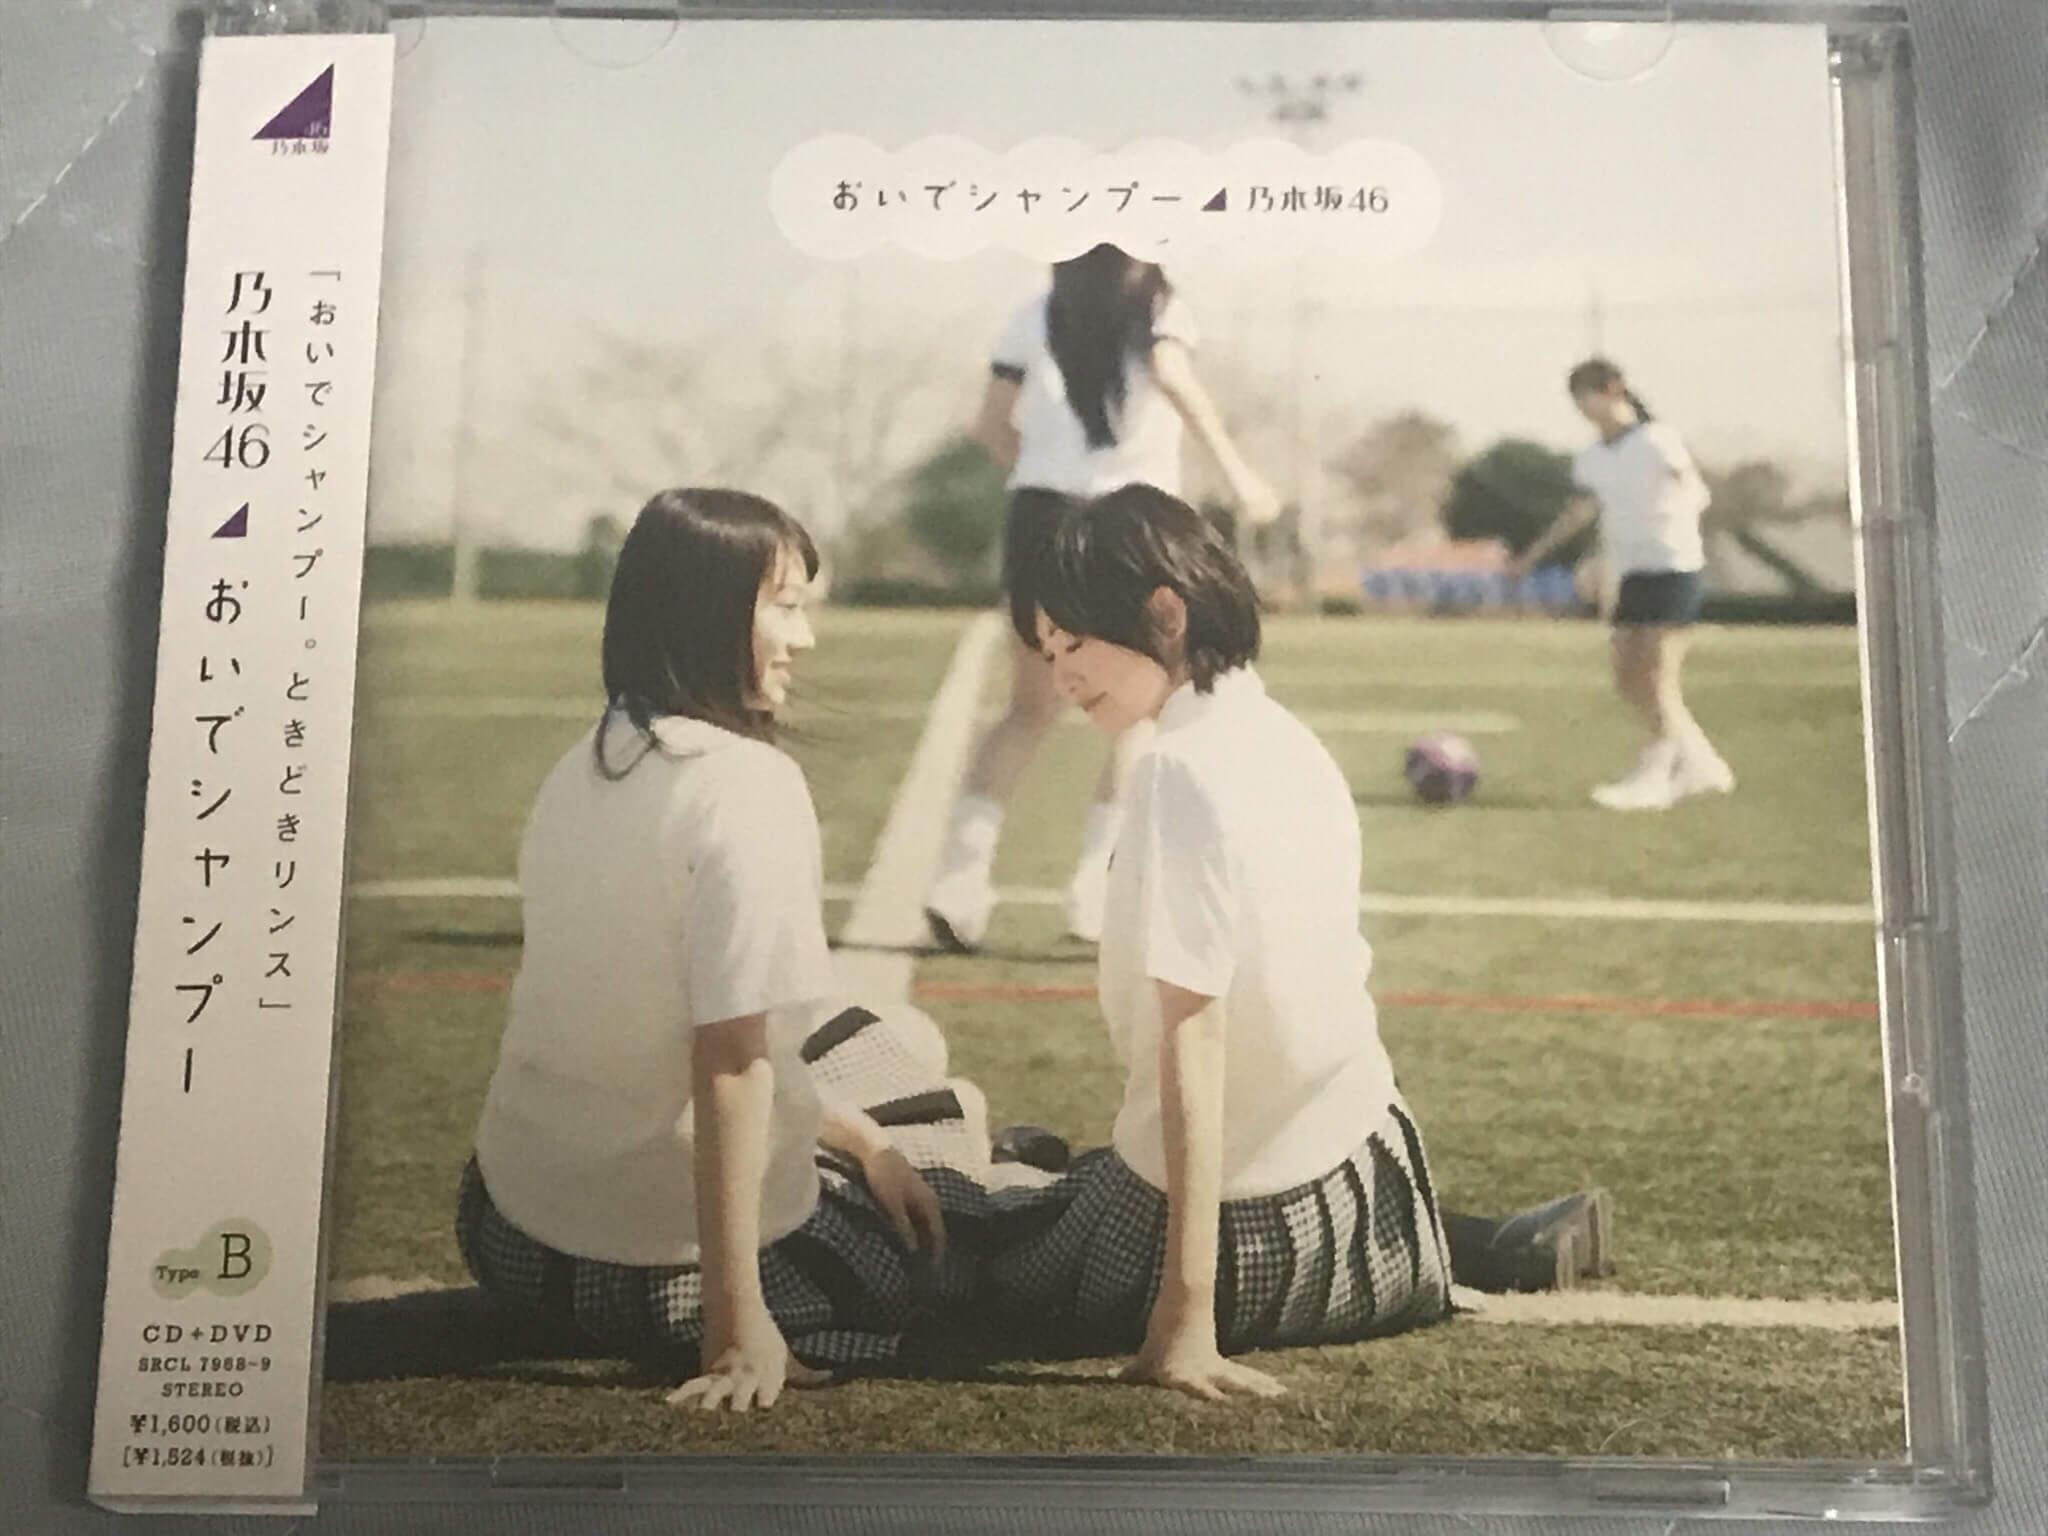 2ndシングル「おいでシャンプー」のすべて!収録曲や特典映像、MV、フォーメーション情報などを紹介!